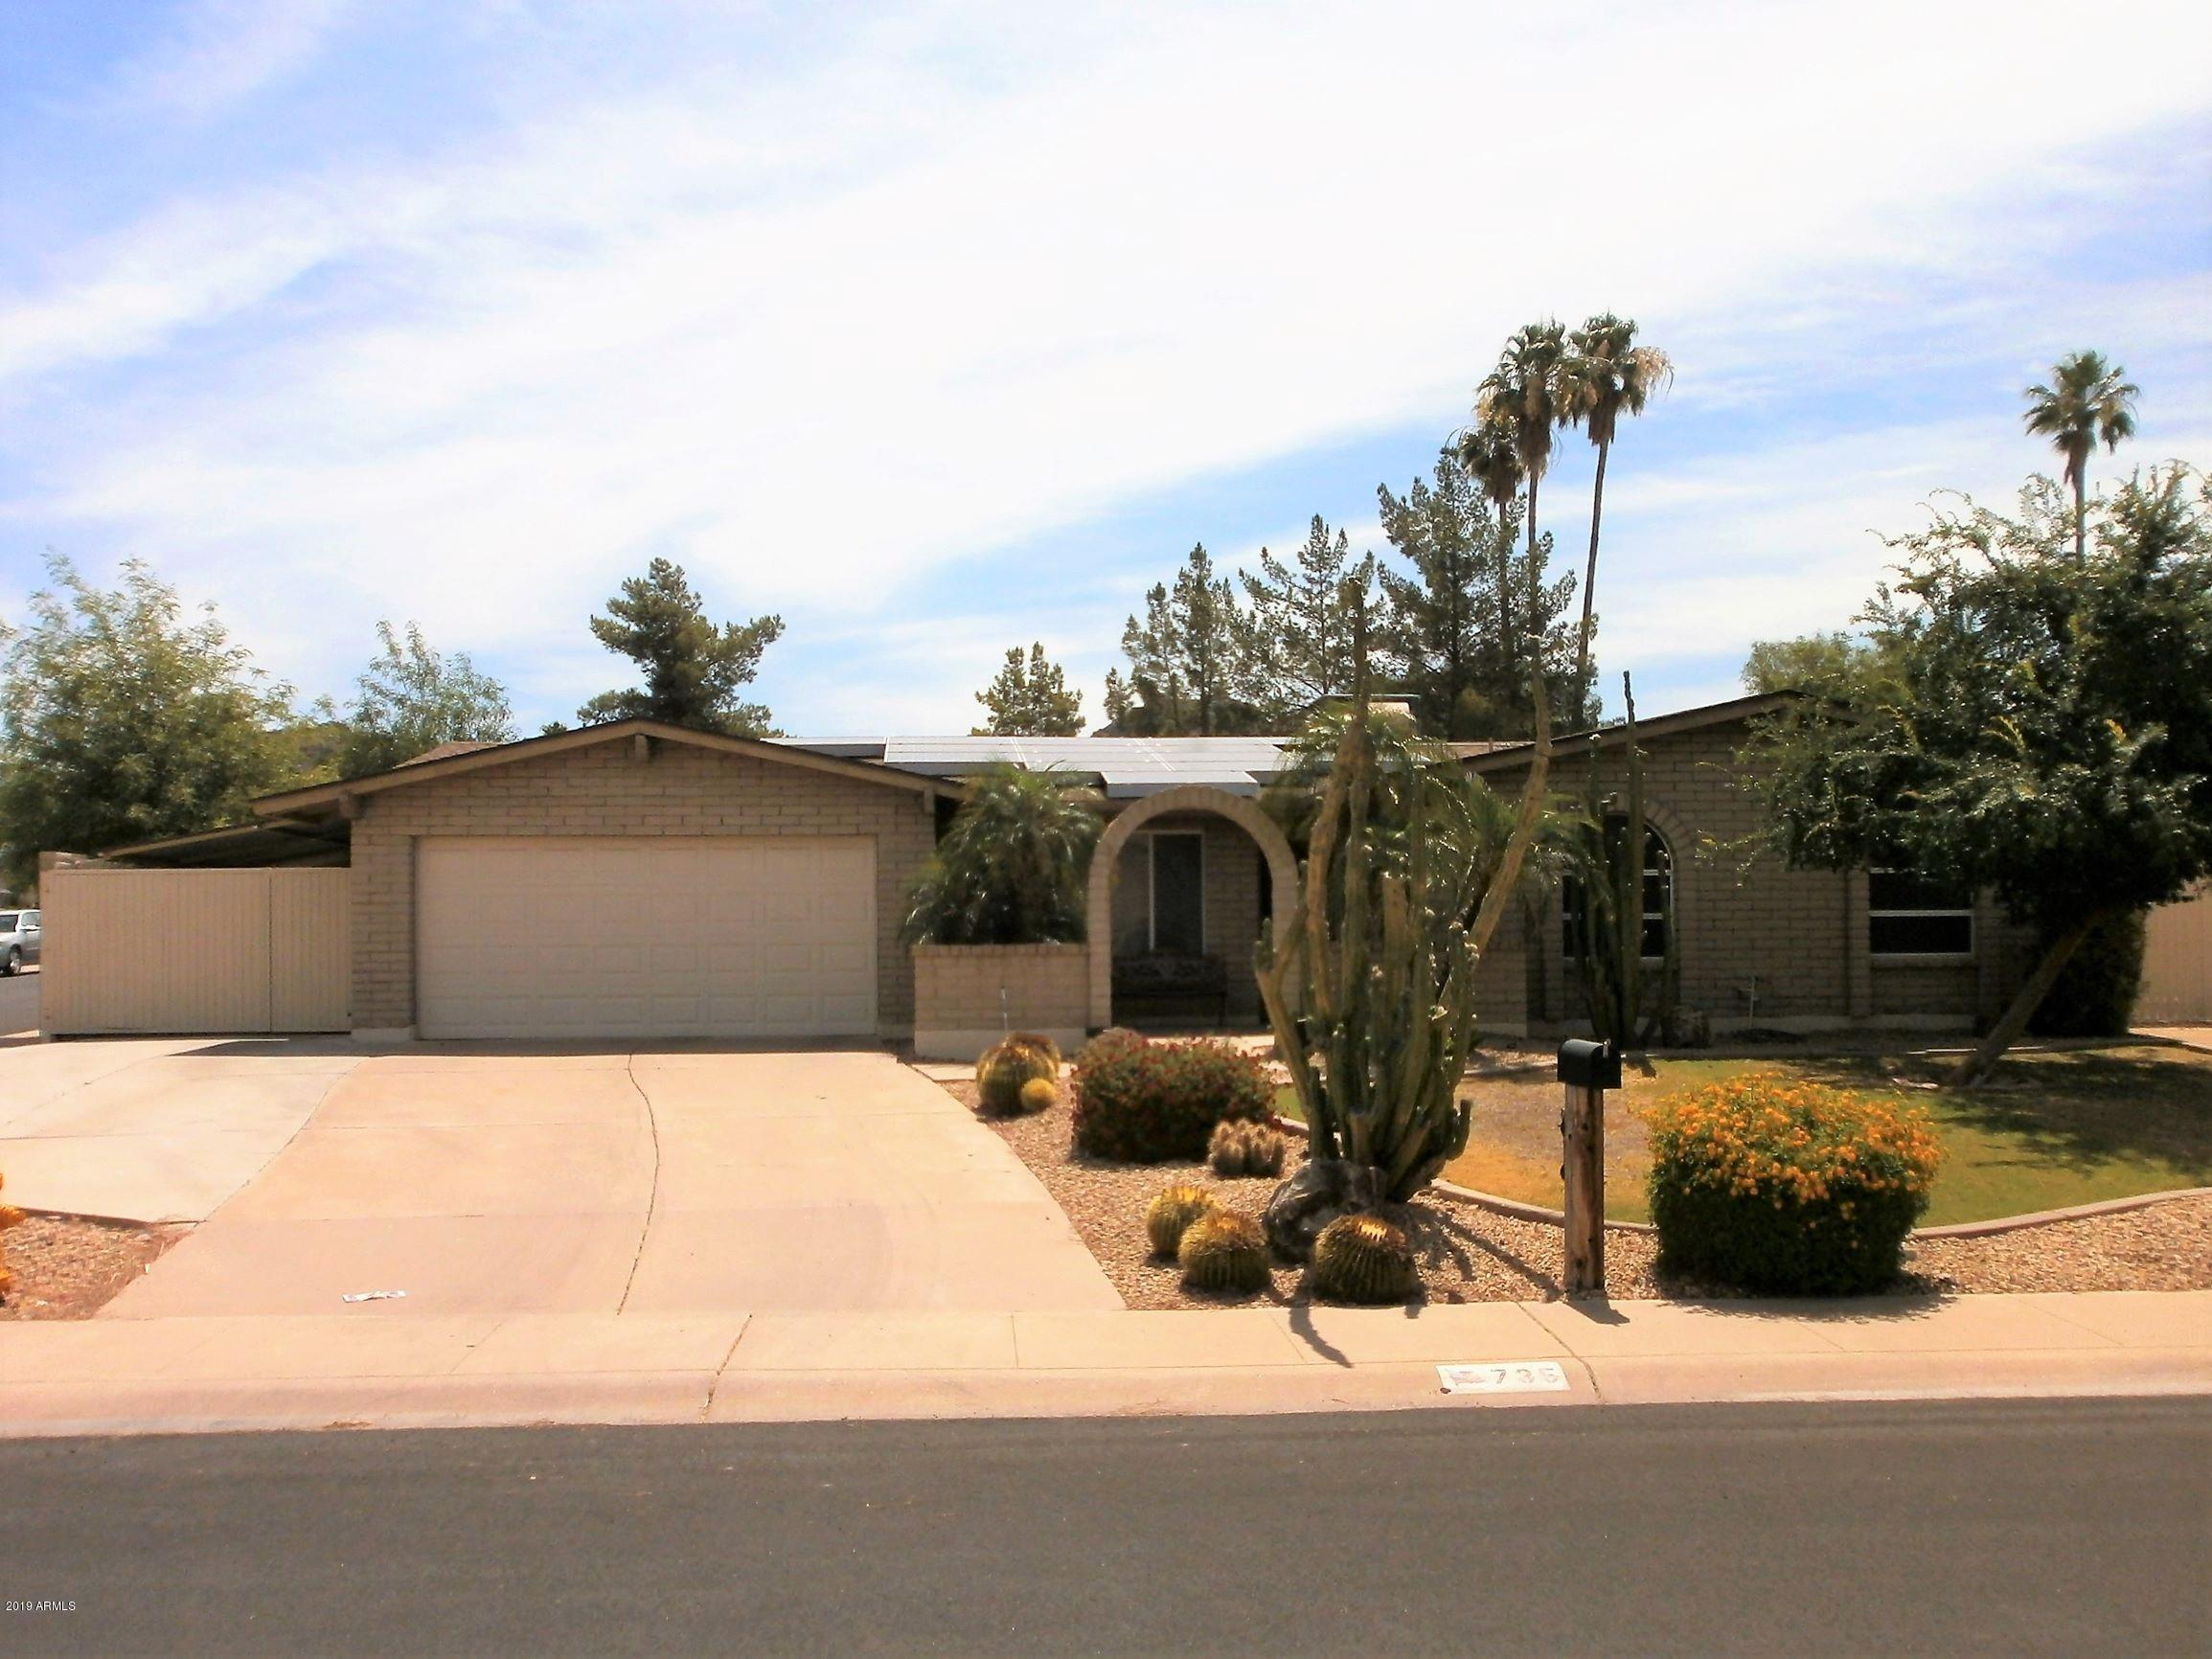 Photo of 735 E ACAPULCO Lane, Phoenix, AZ 85022